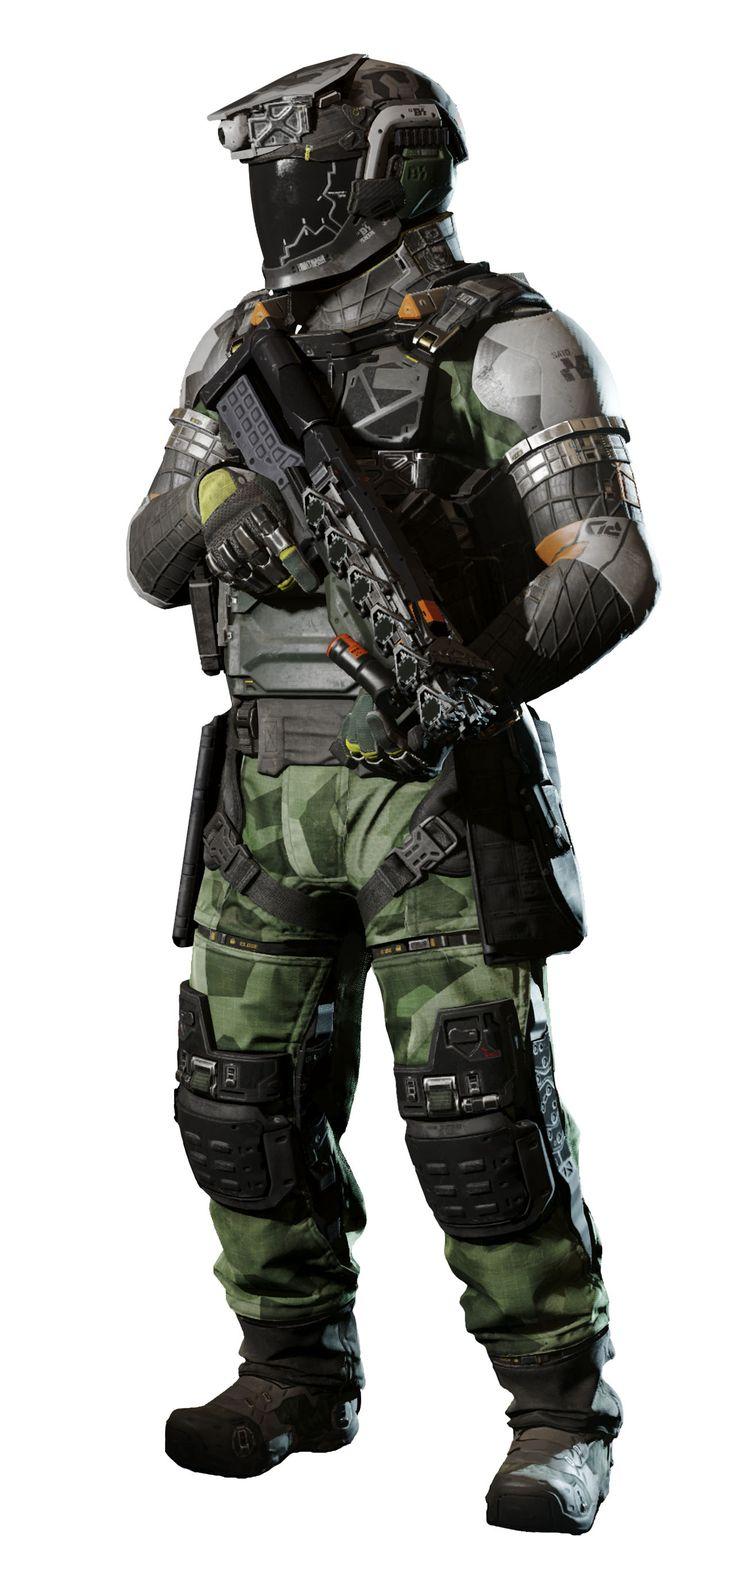 Call of Duty: Infinite Warfare Story Trailer Debuts – ComingSoon.net